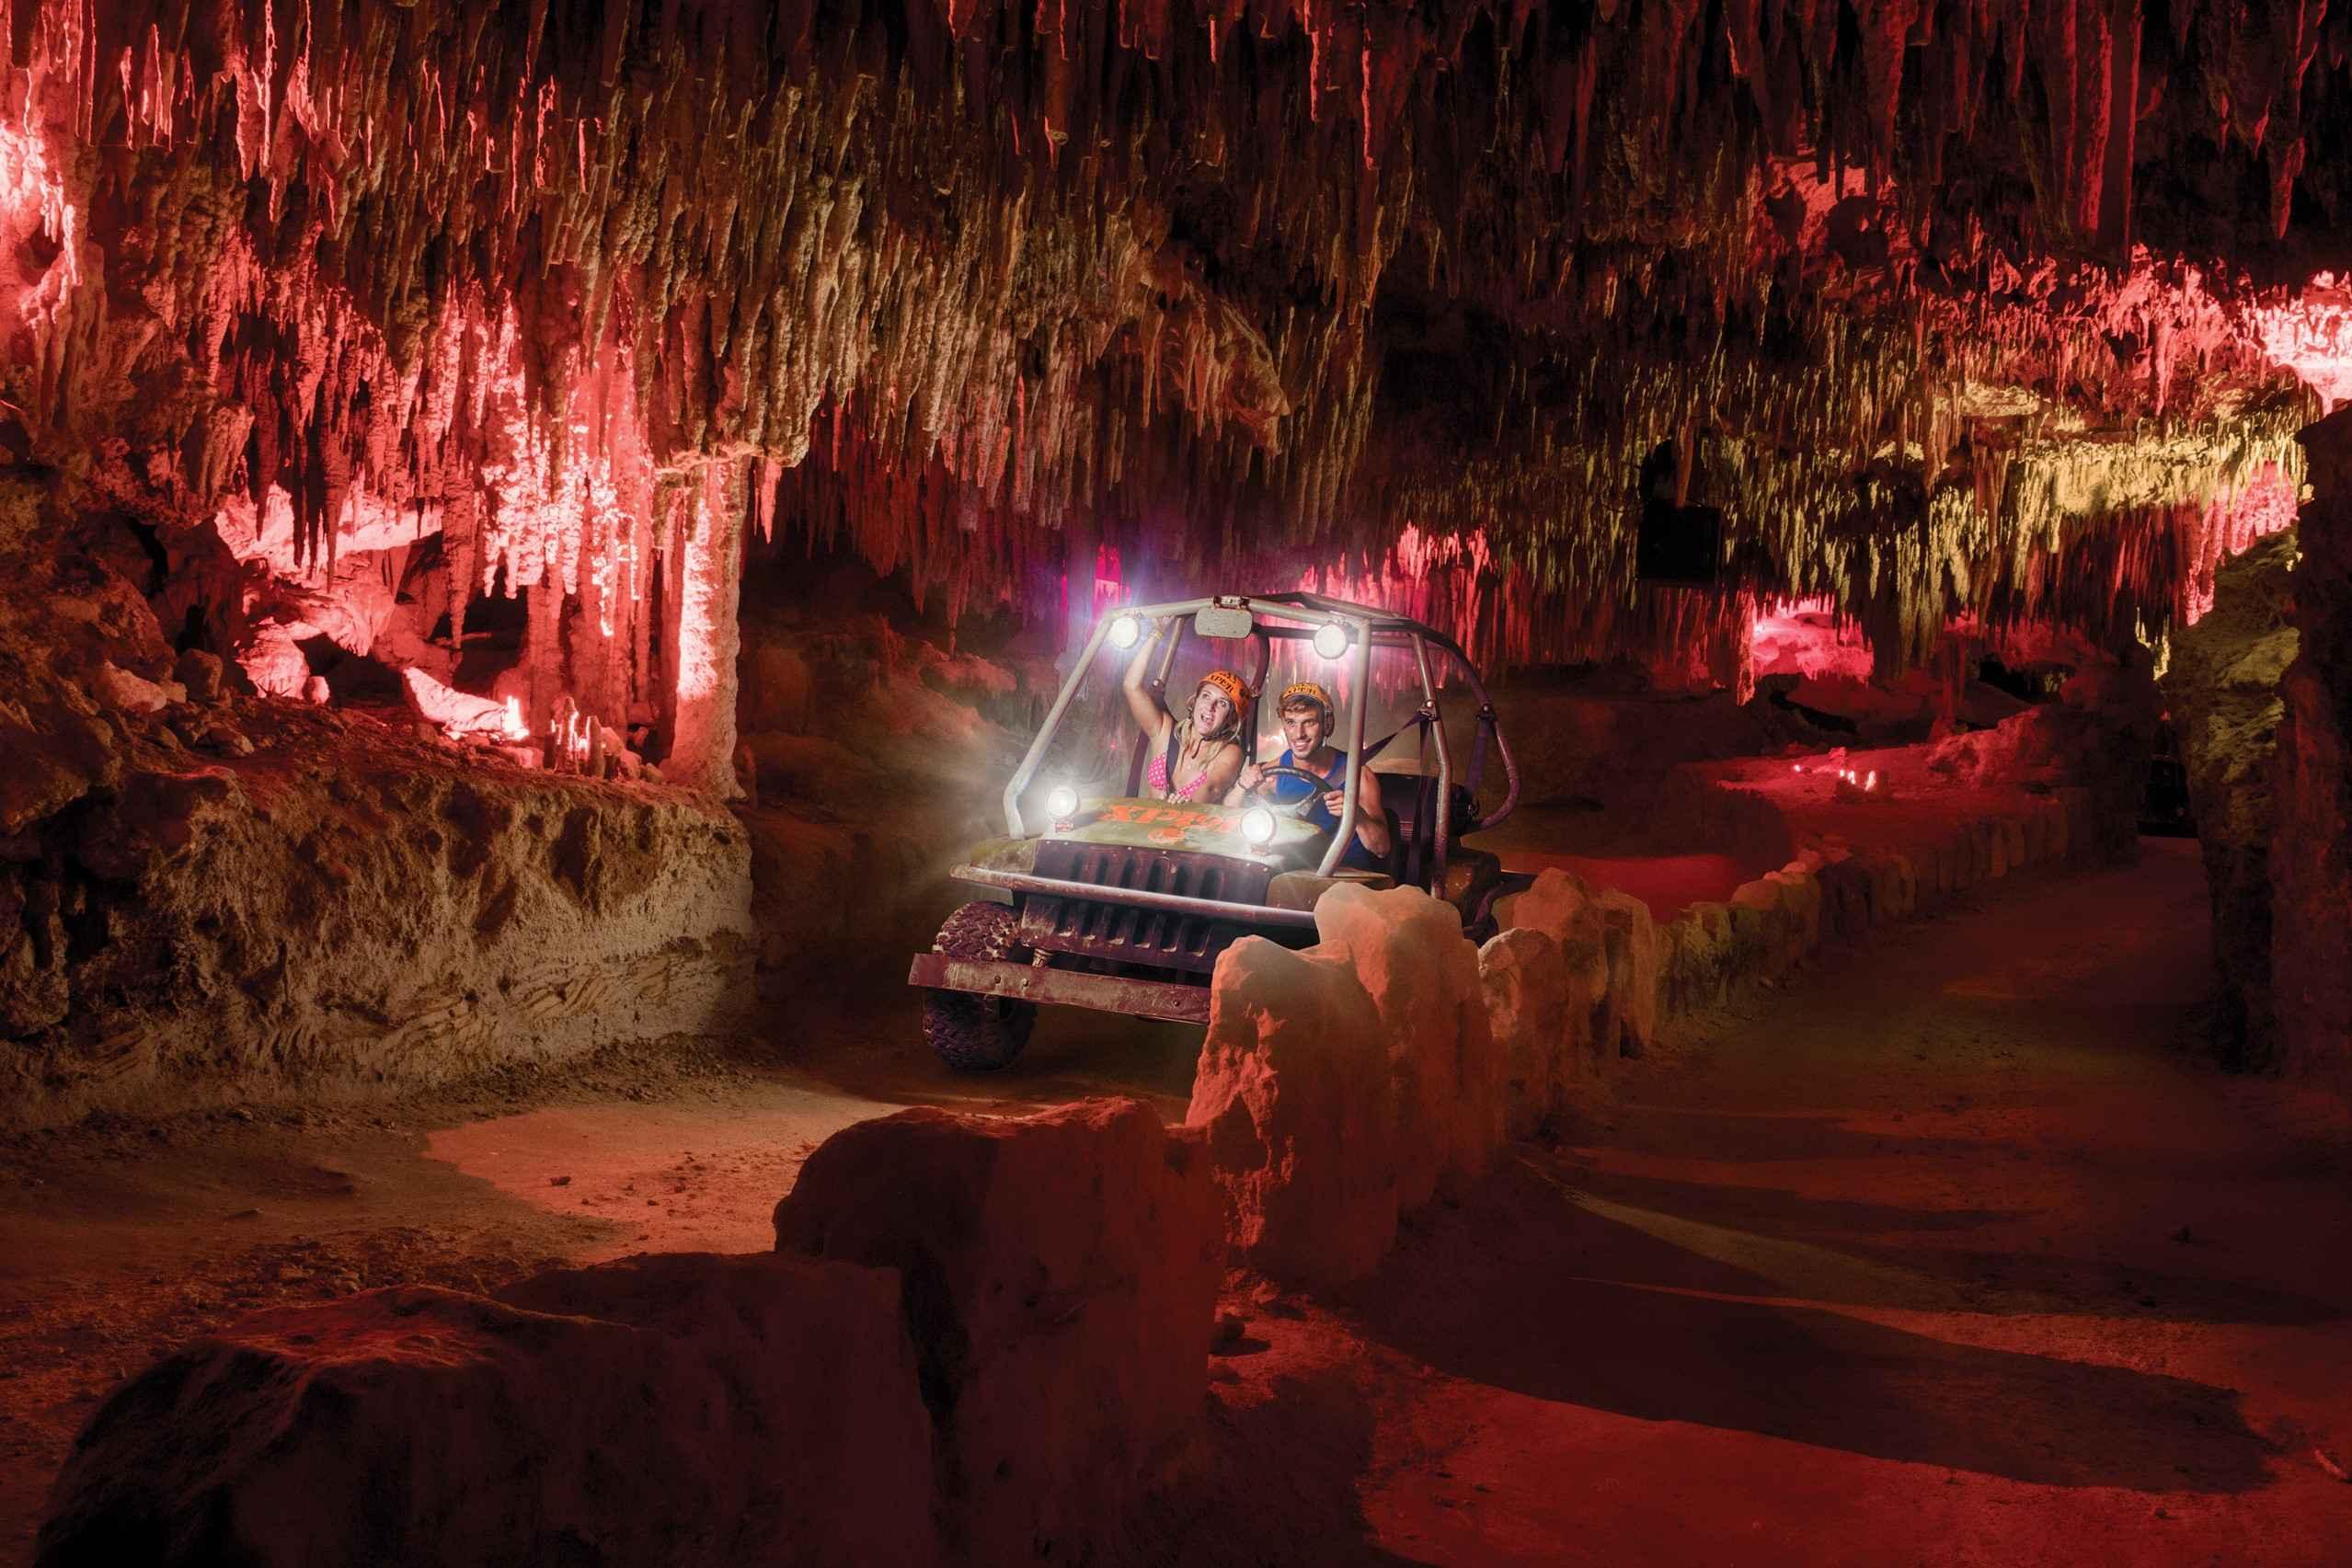 México Travel Solutions Admission To Xplor Fuego